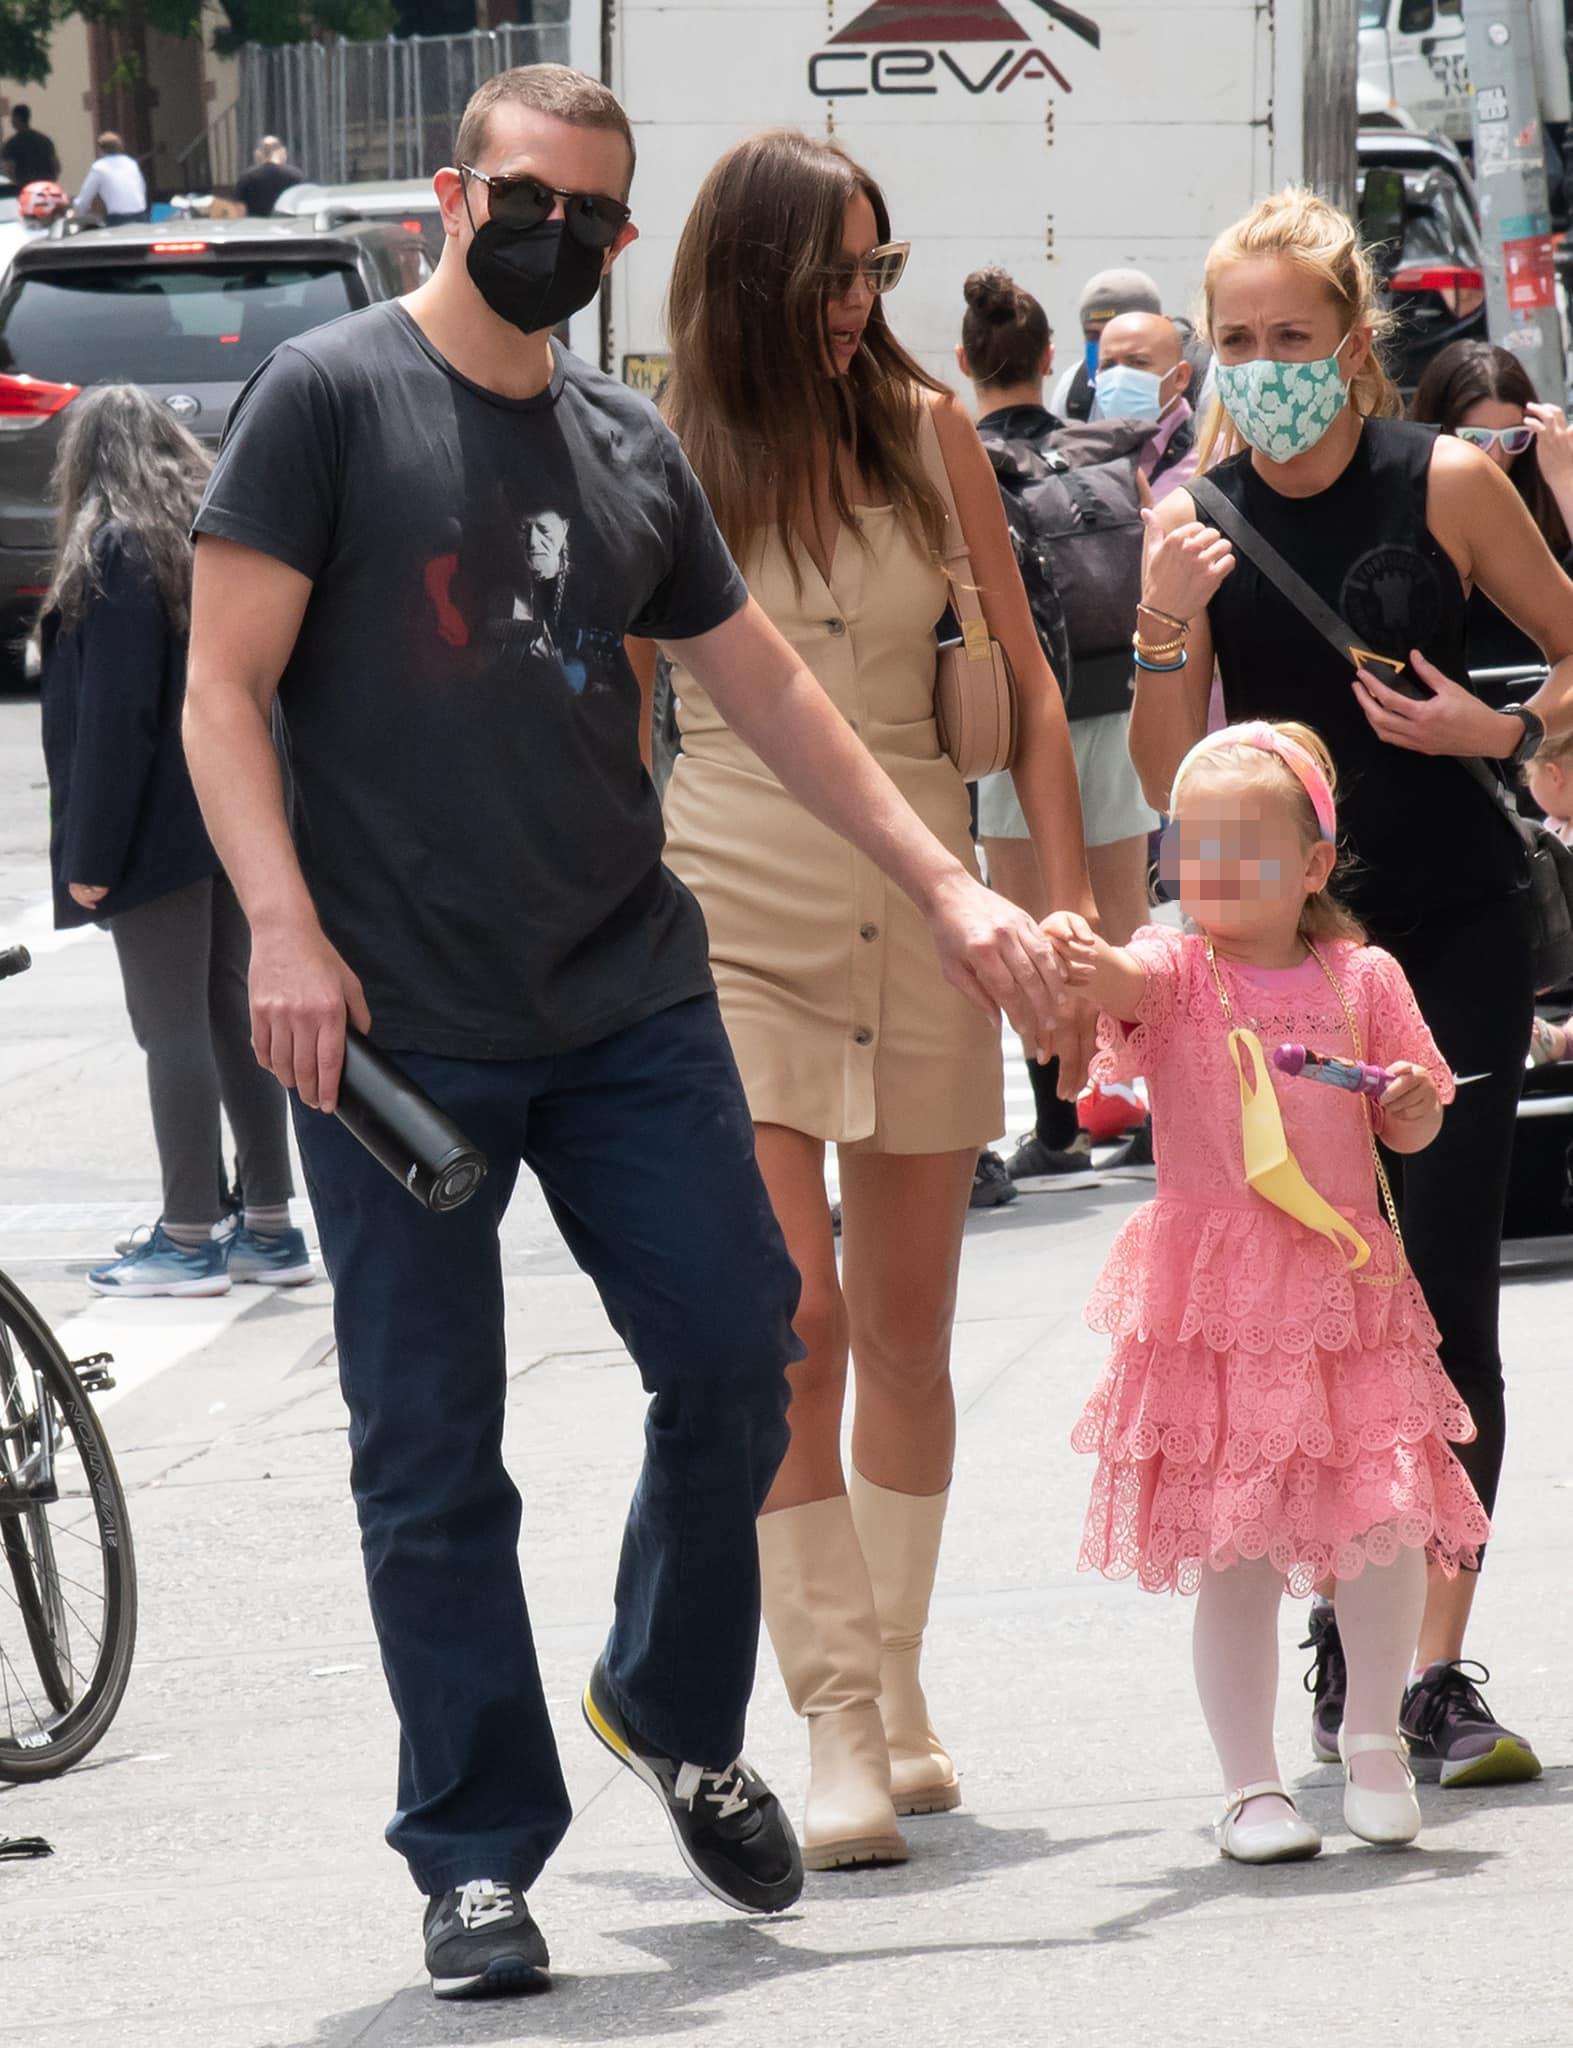 Bradley Cooper joins ex Irina Shayk and daughter Lea de Seine on a stroll in New York City on June 2, 2021